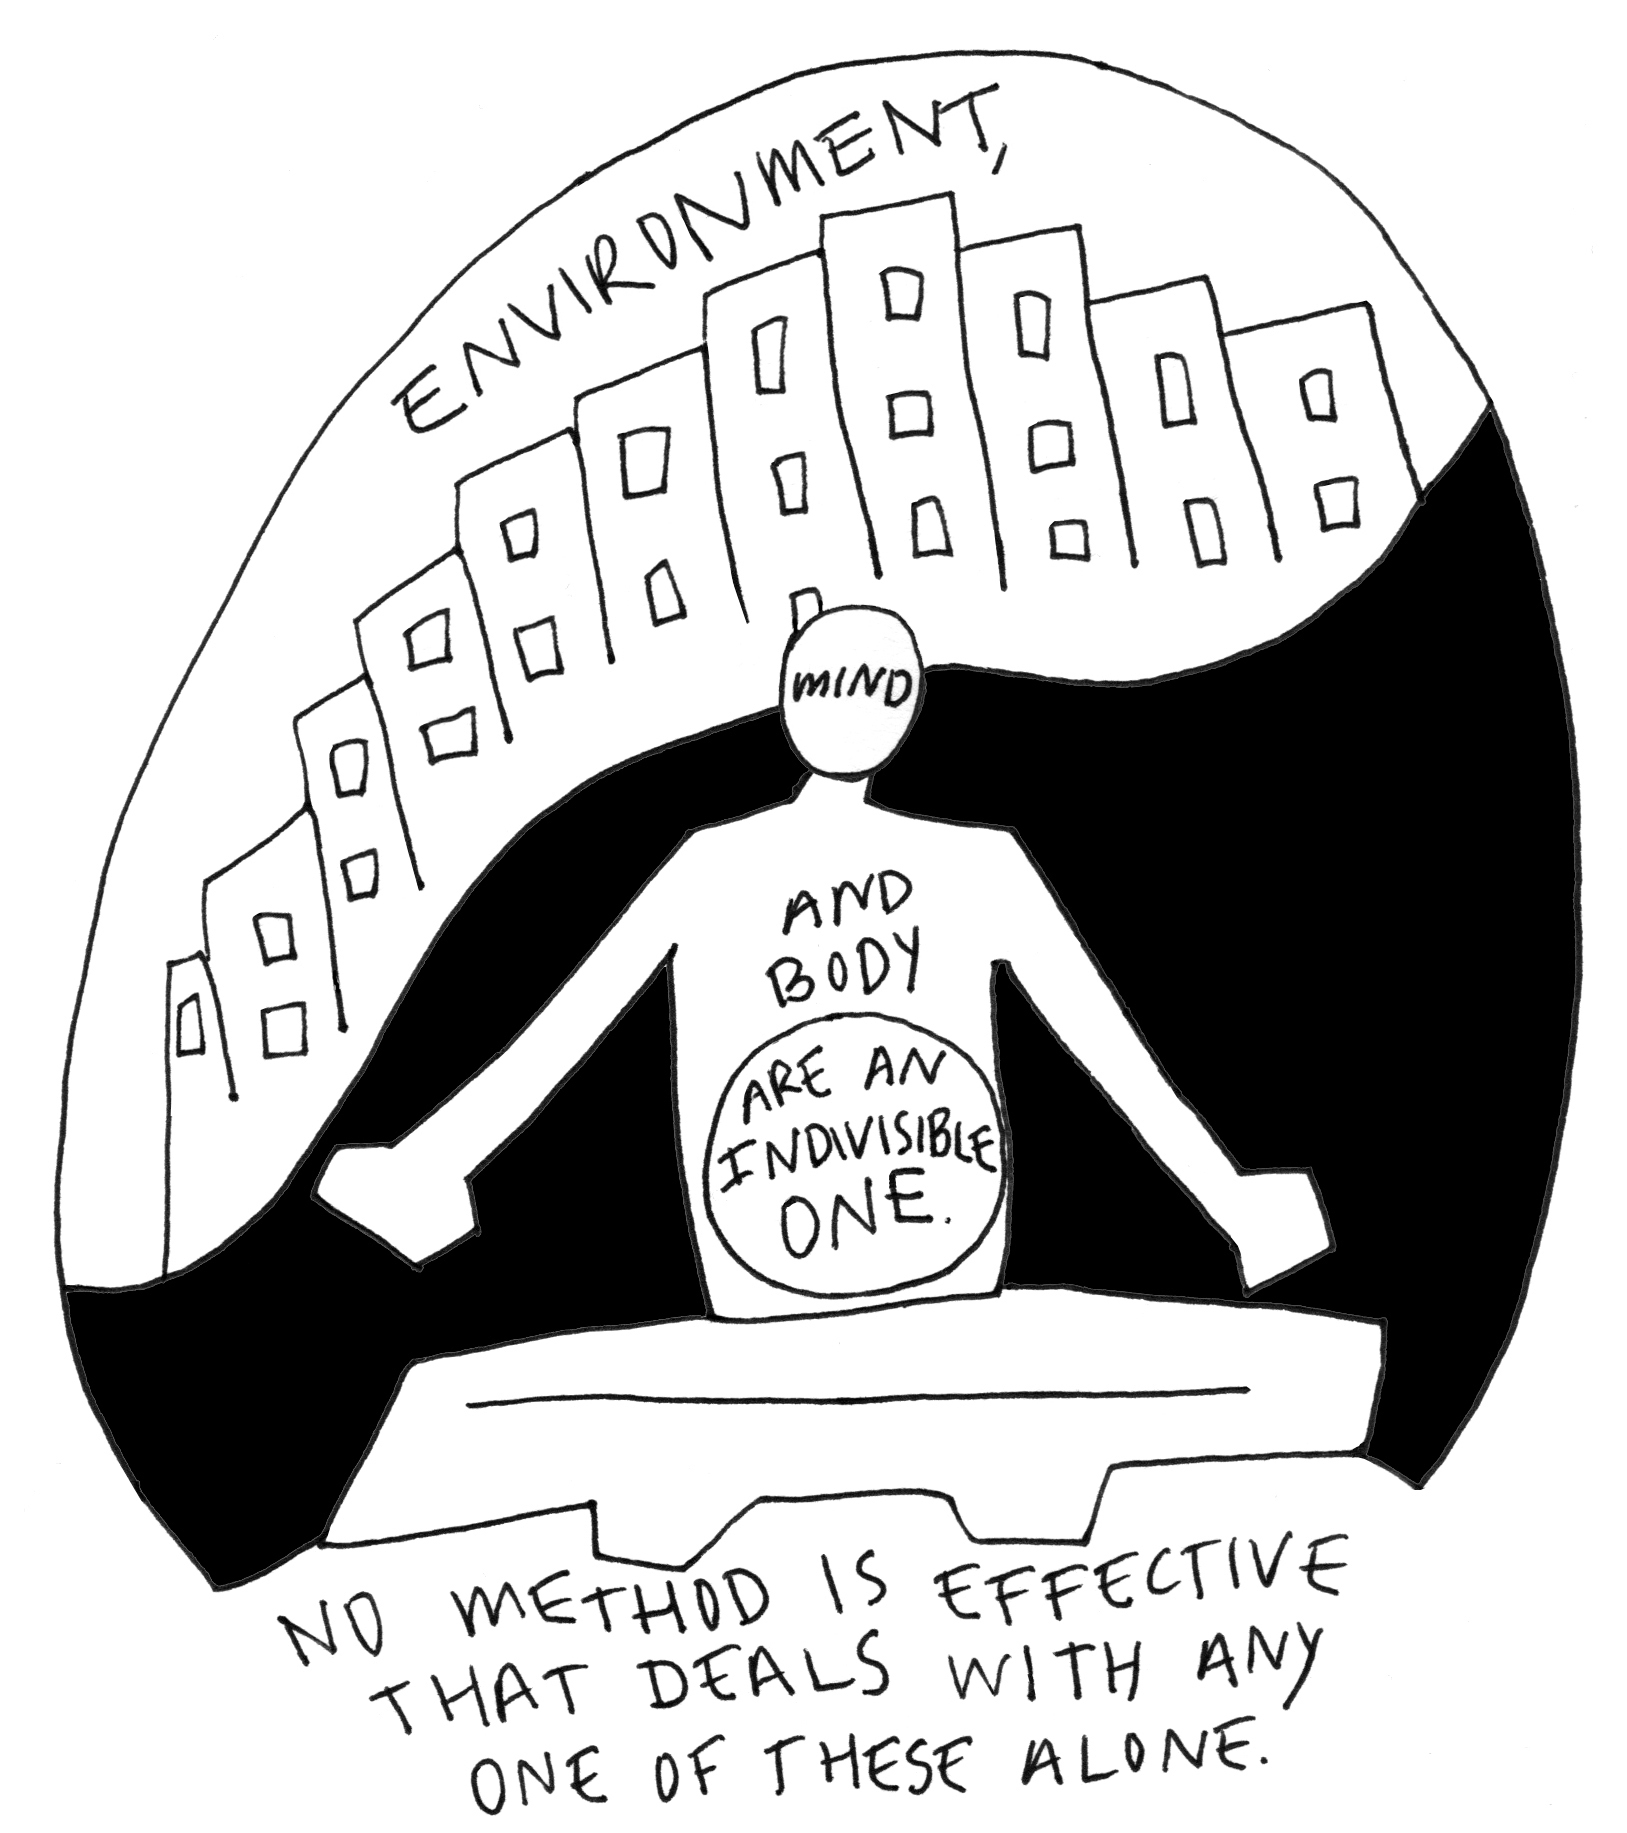 Environment mind and body3 - C-NOE .jpg